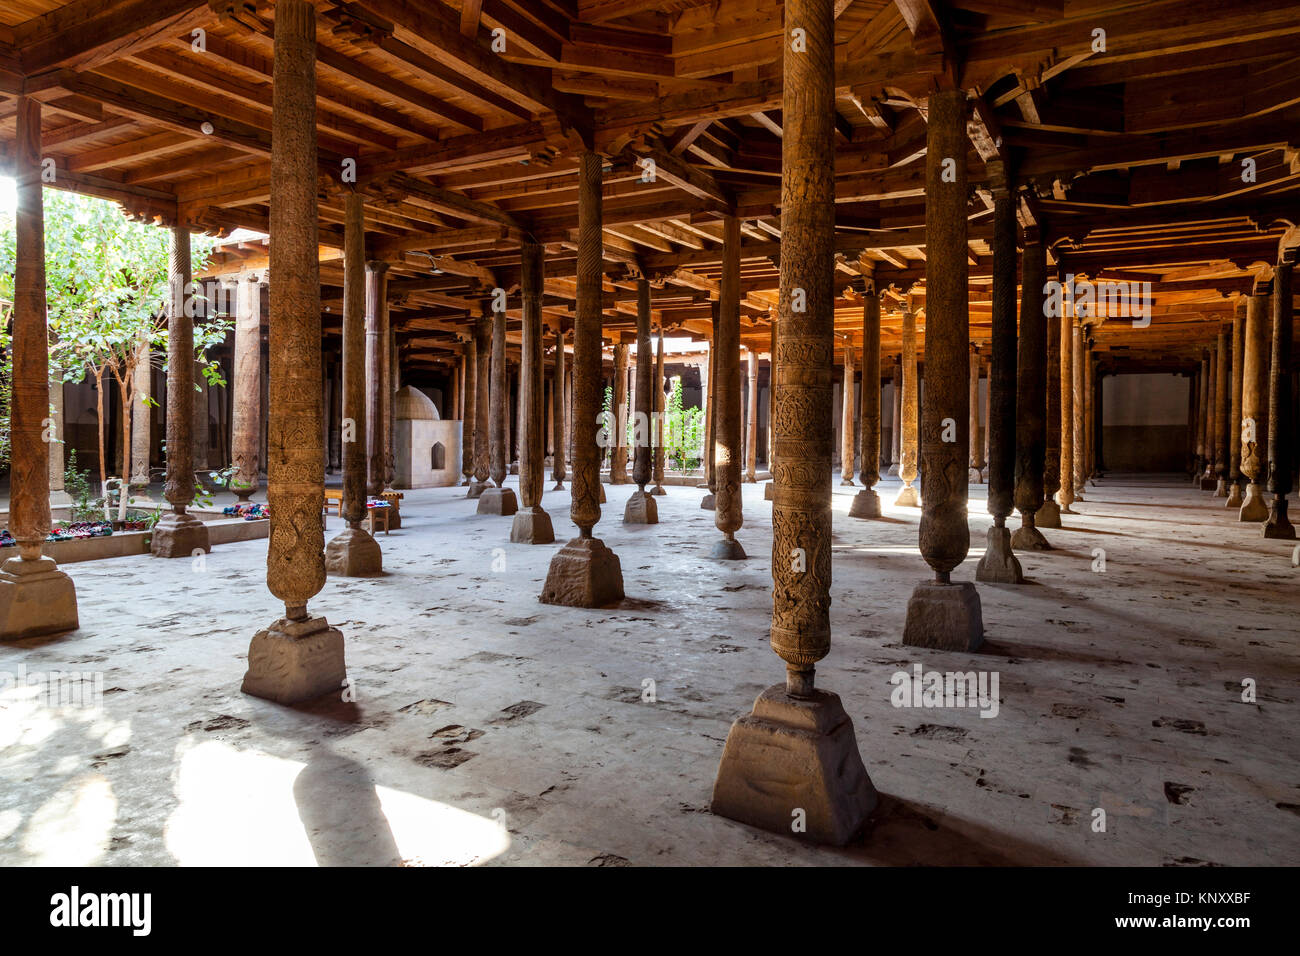 The Interior Of The Juma Mosque, Khiva, Uzbekistan - Stock Image